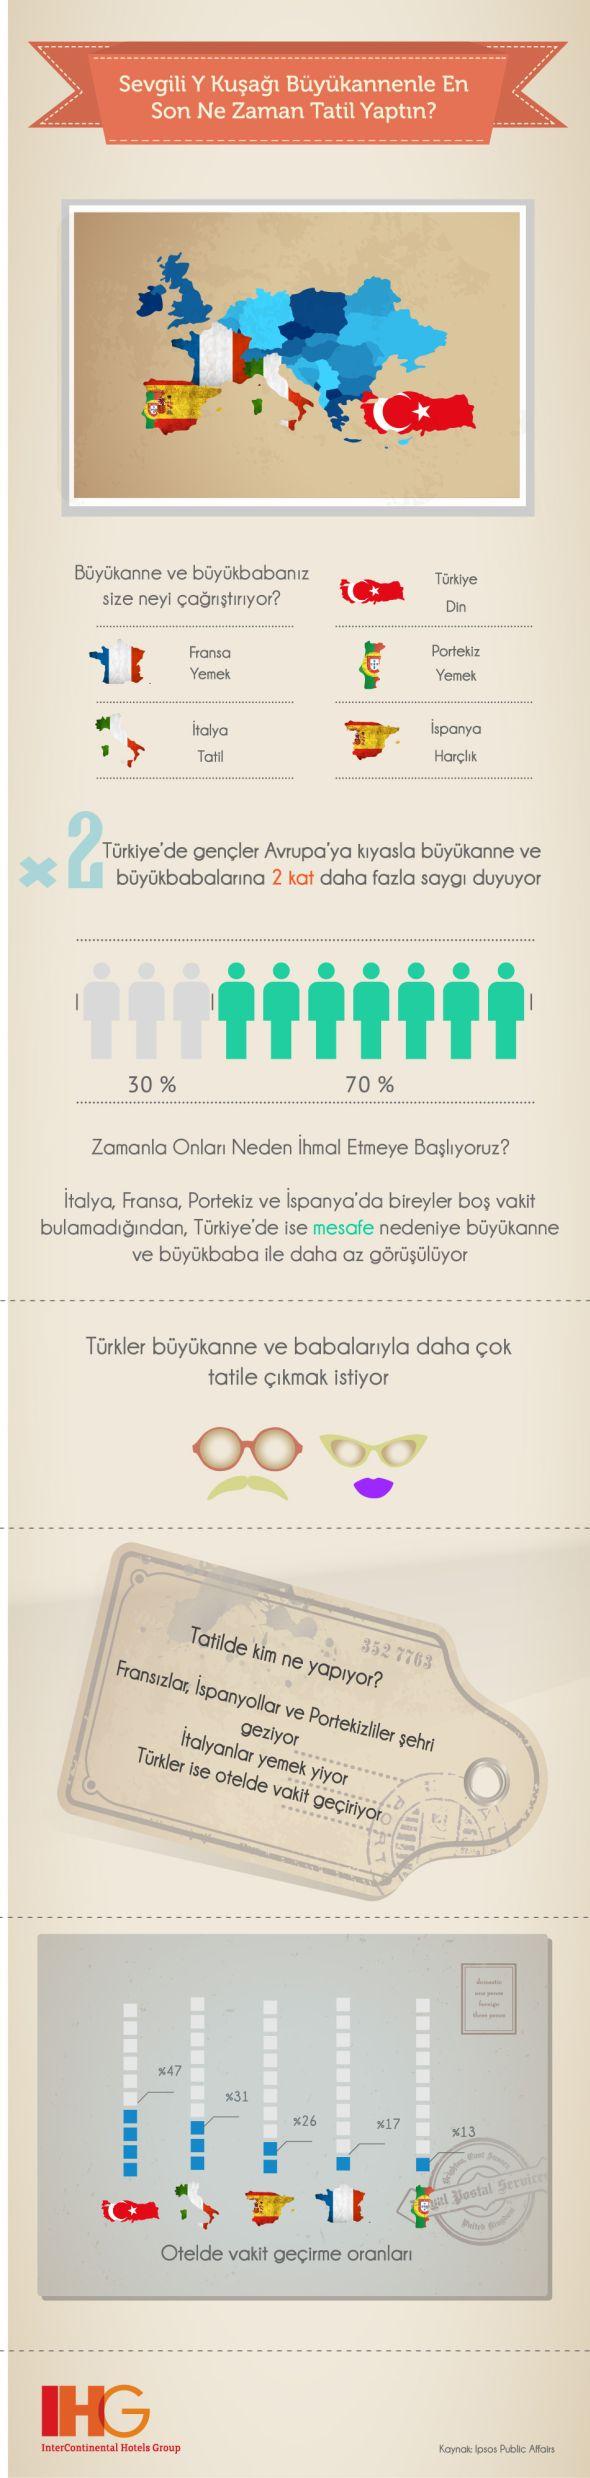 Turkiye-Yasli-Teknoloji-Kullanimi